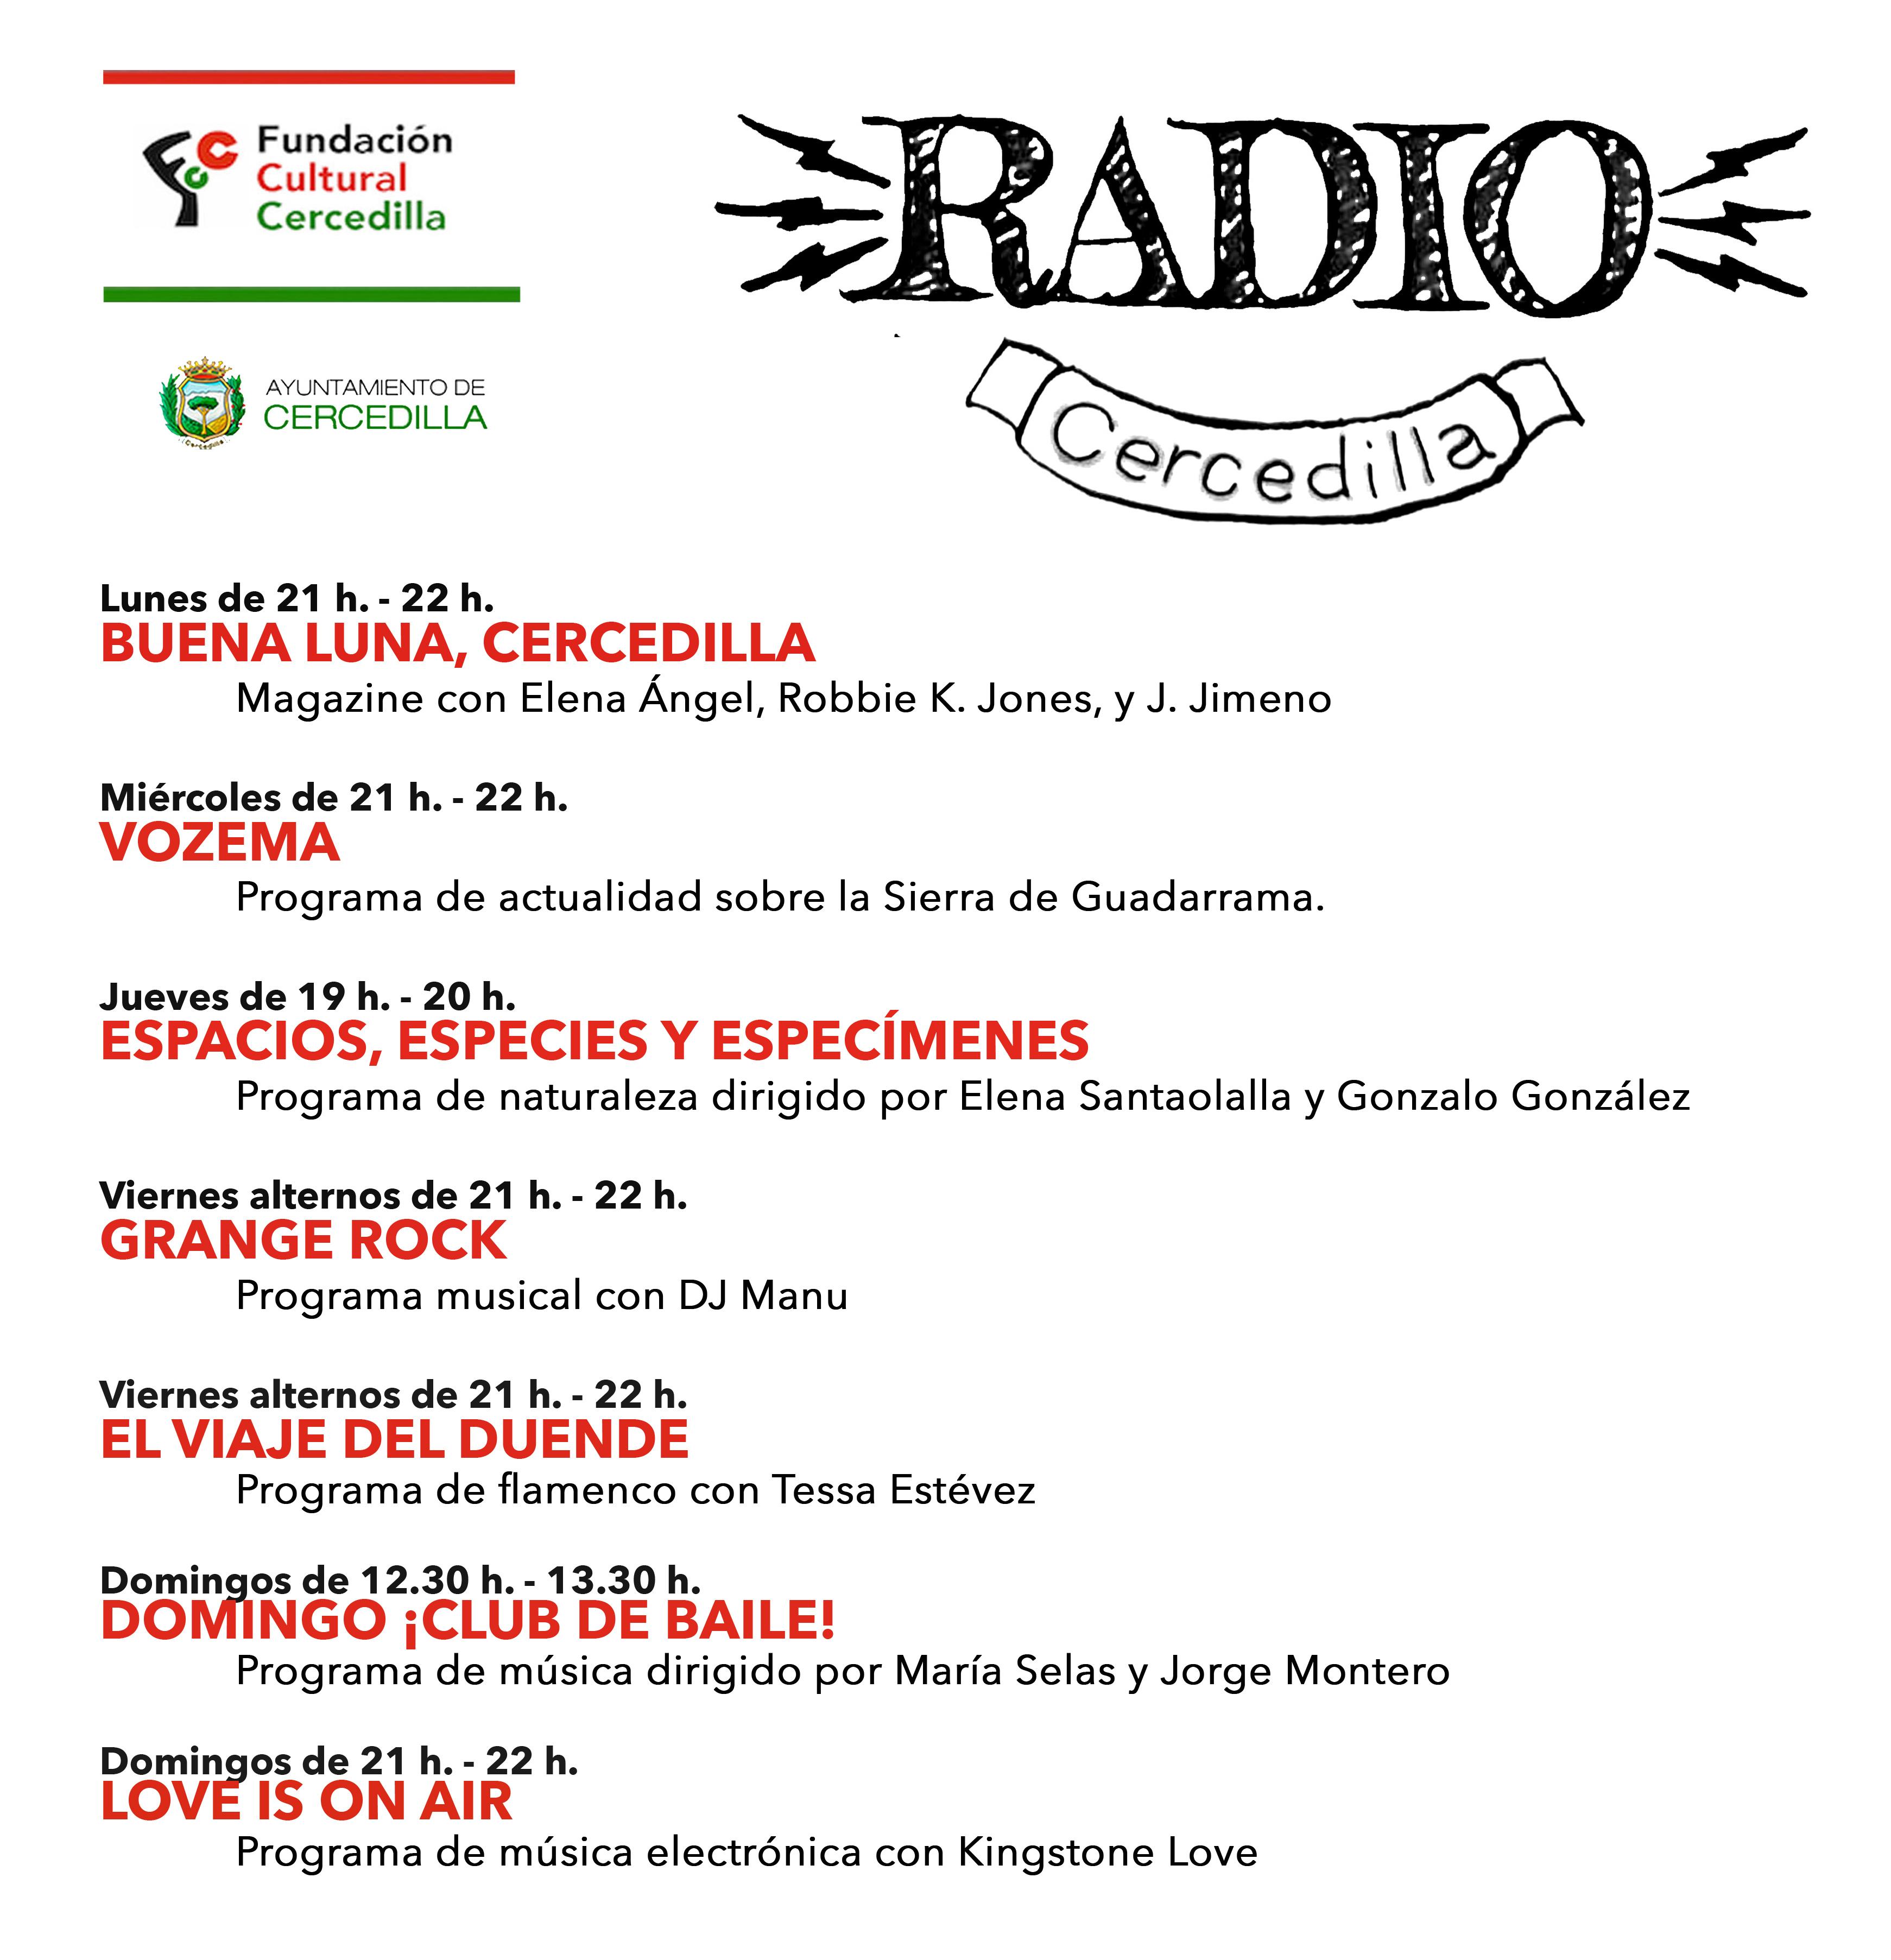 Parrilla radio cercedilla OCT 2021